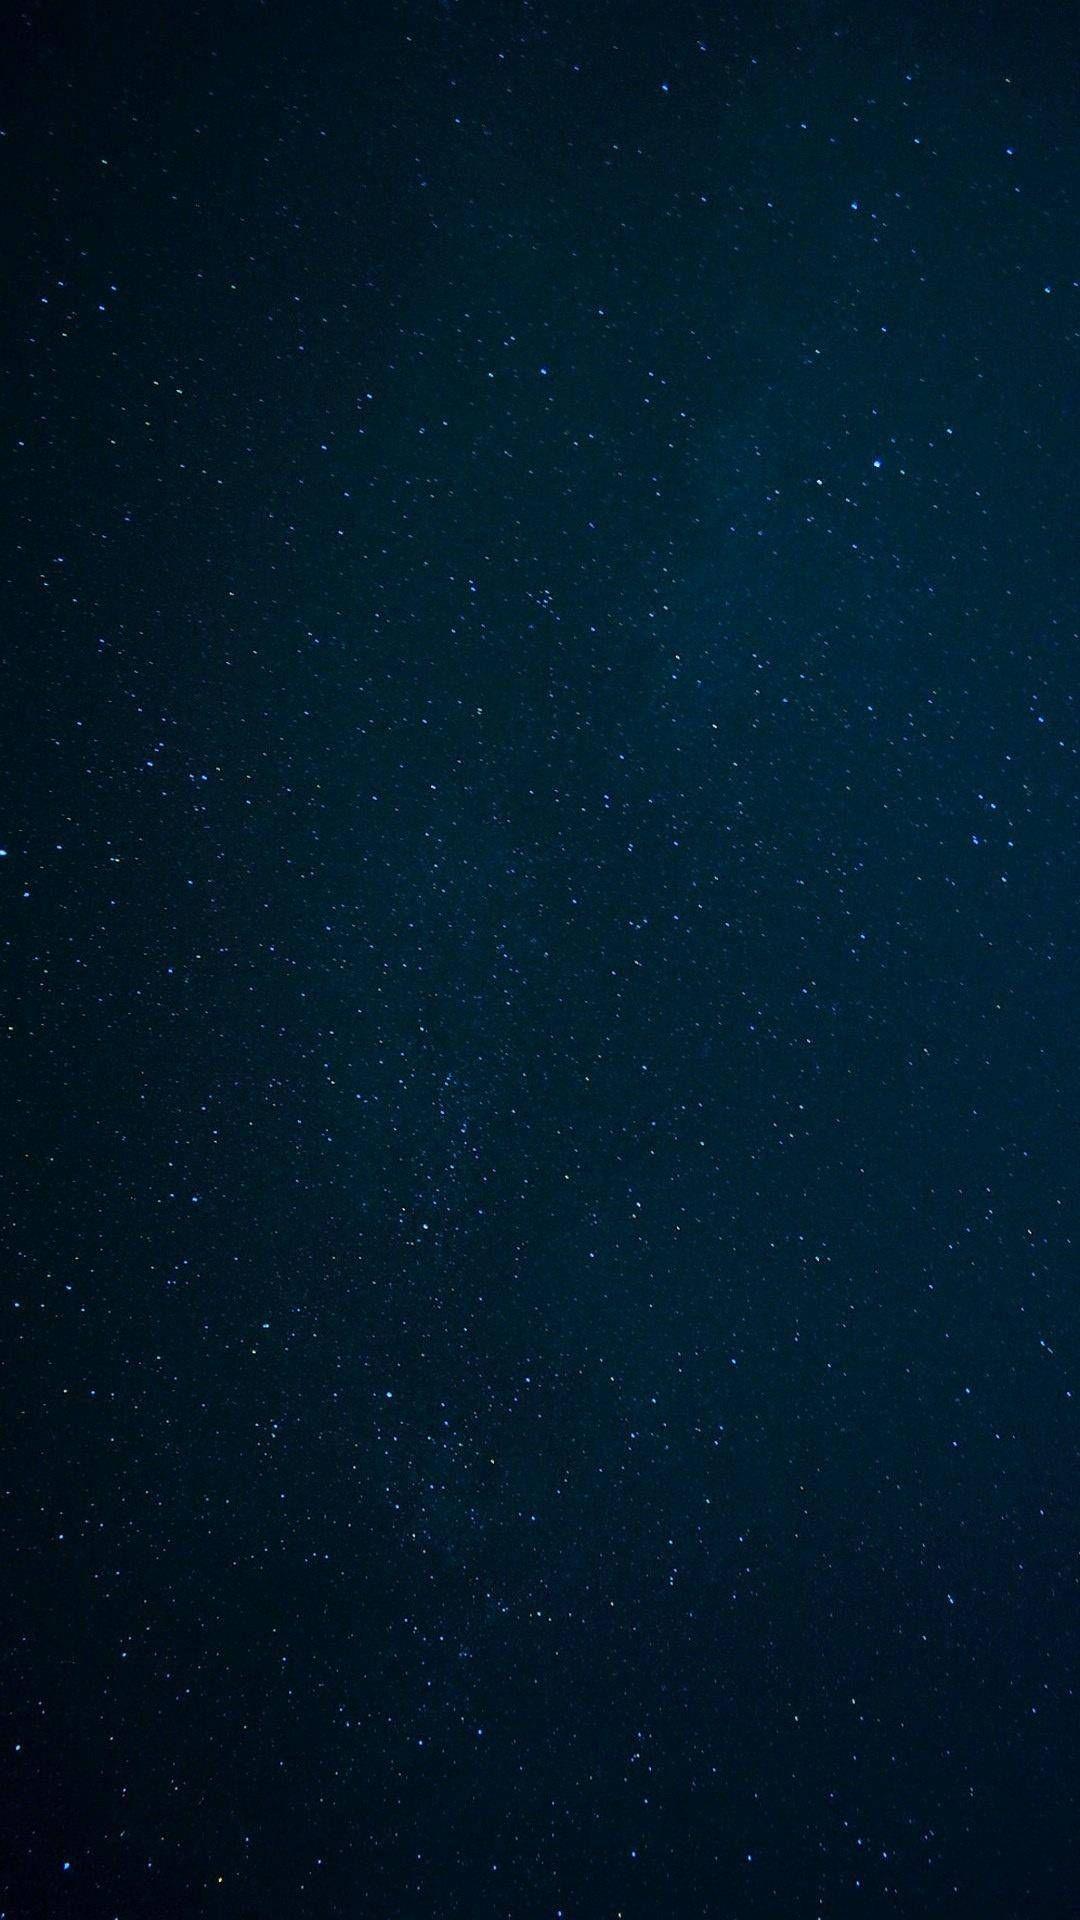 Space Stars Night iPhone Wallpaper